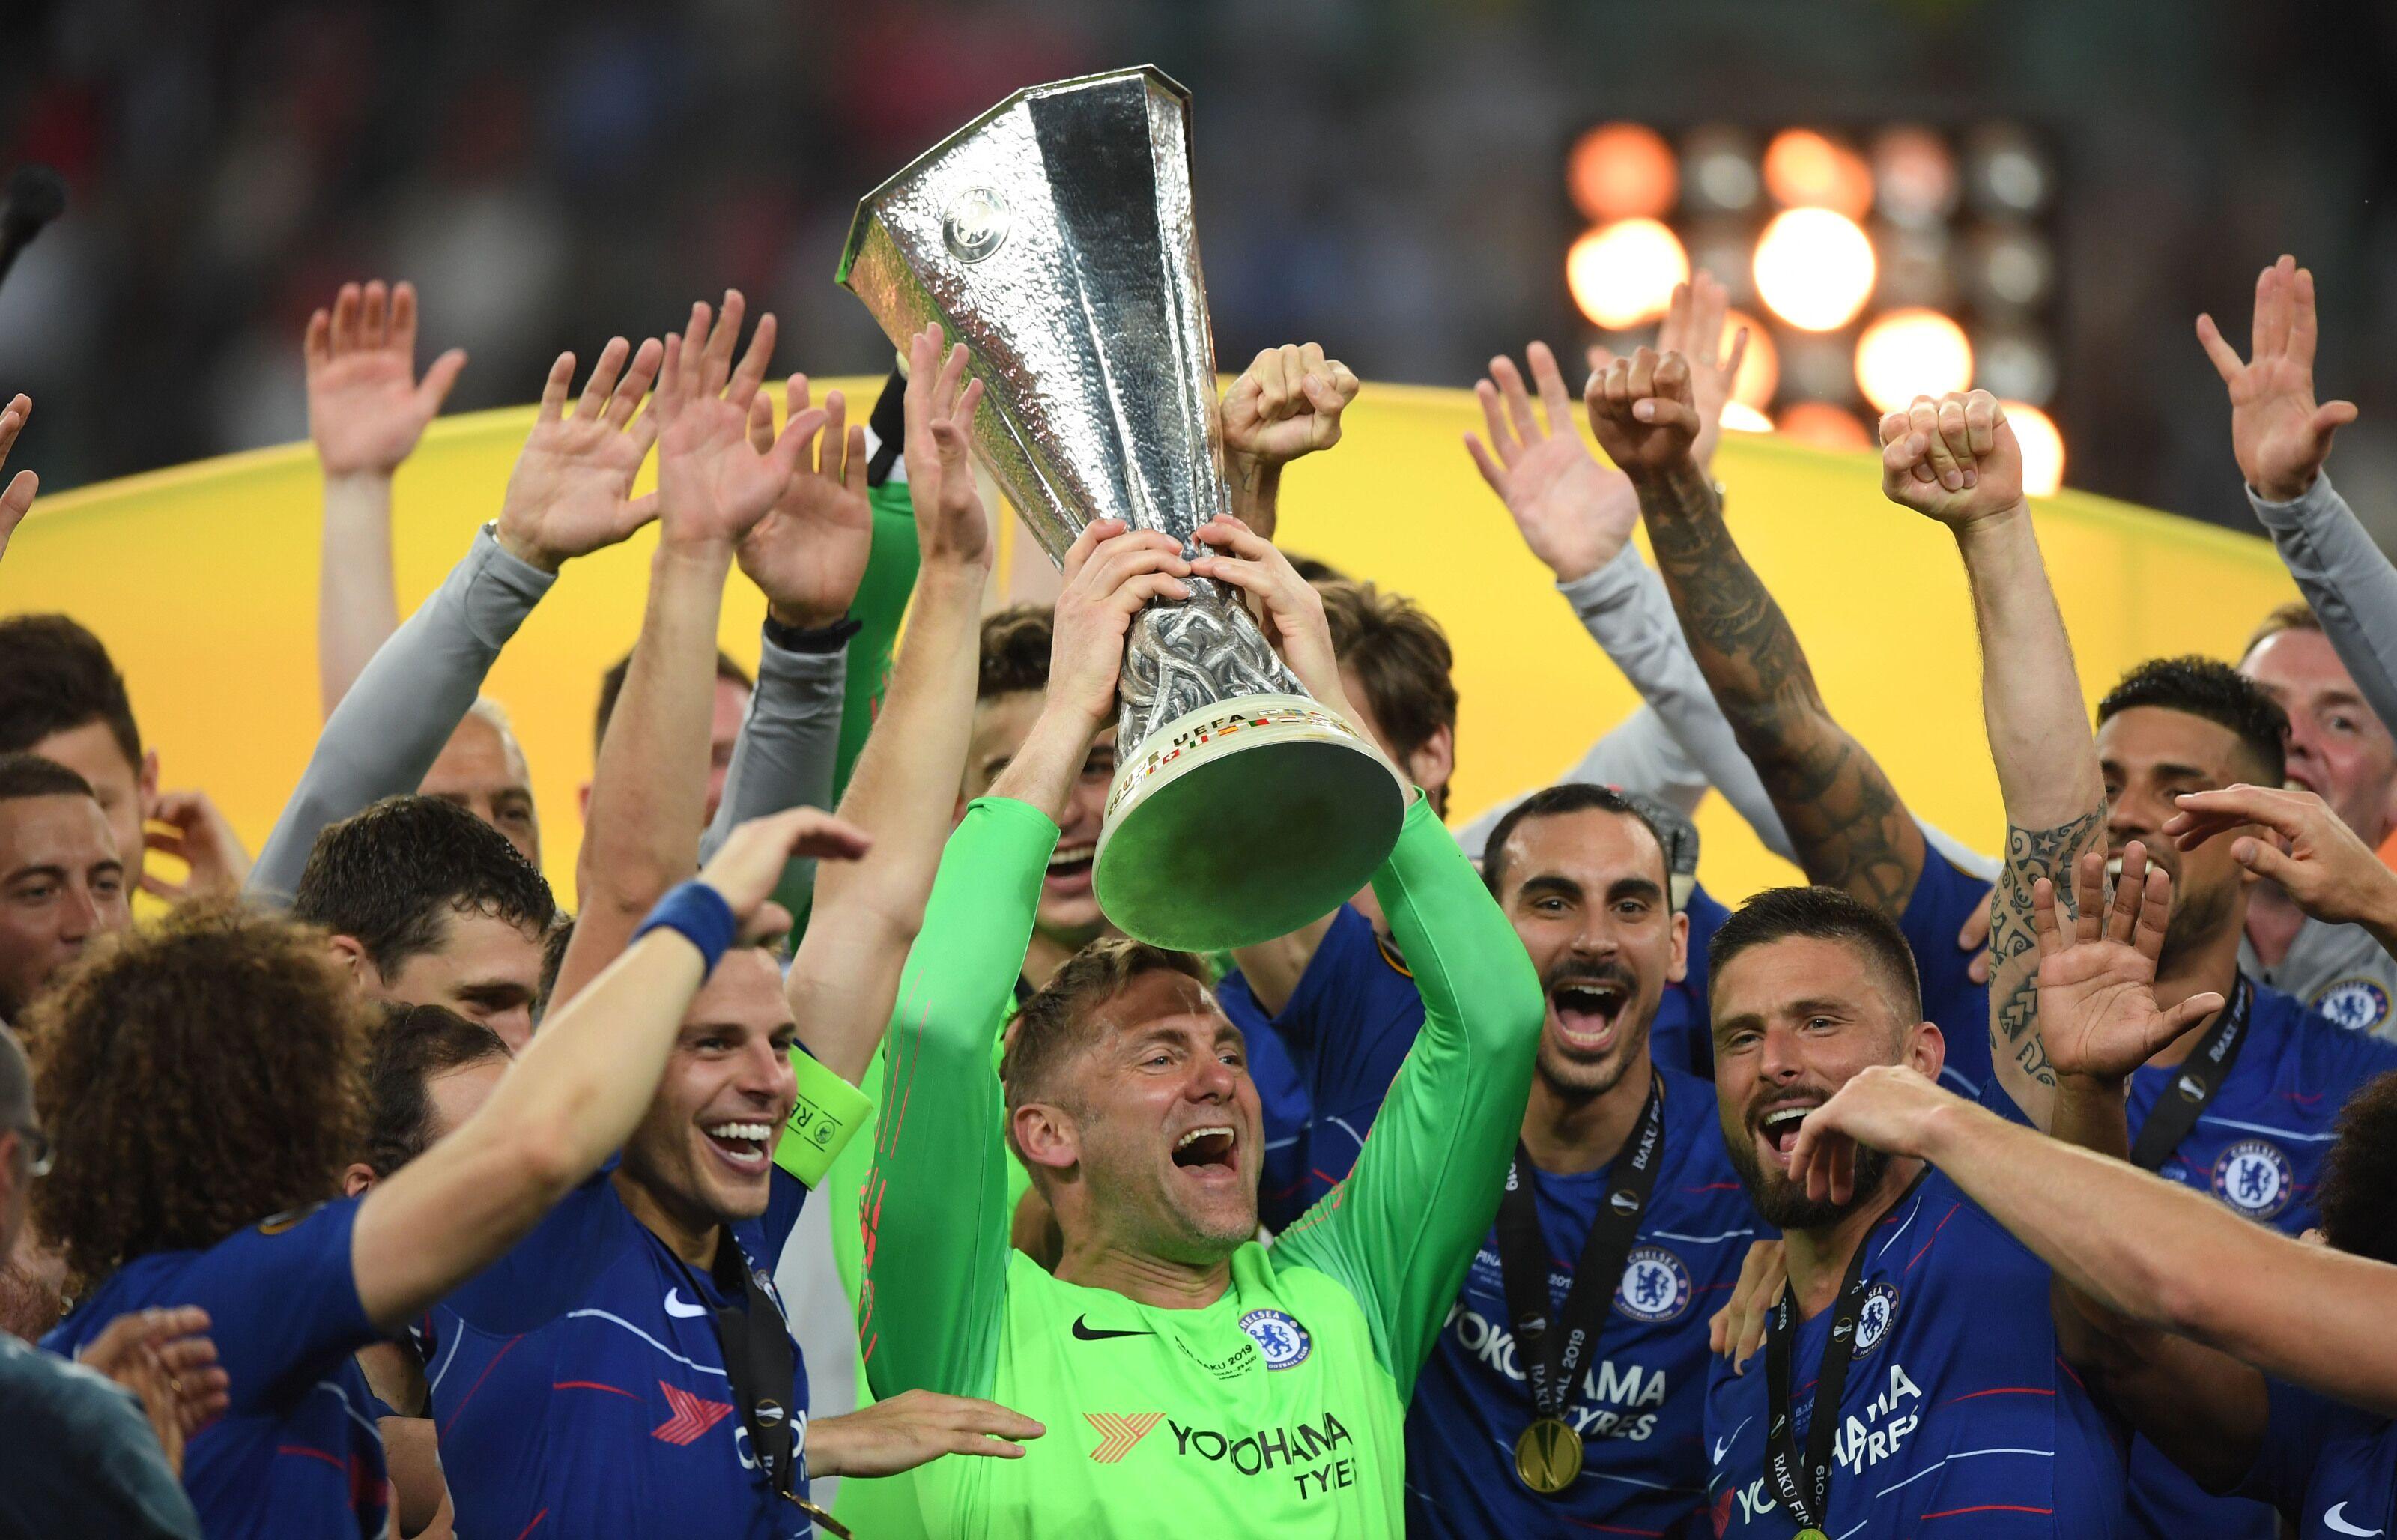 Chelsea: Rob Green, like others, still trying to make sense of last season